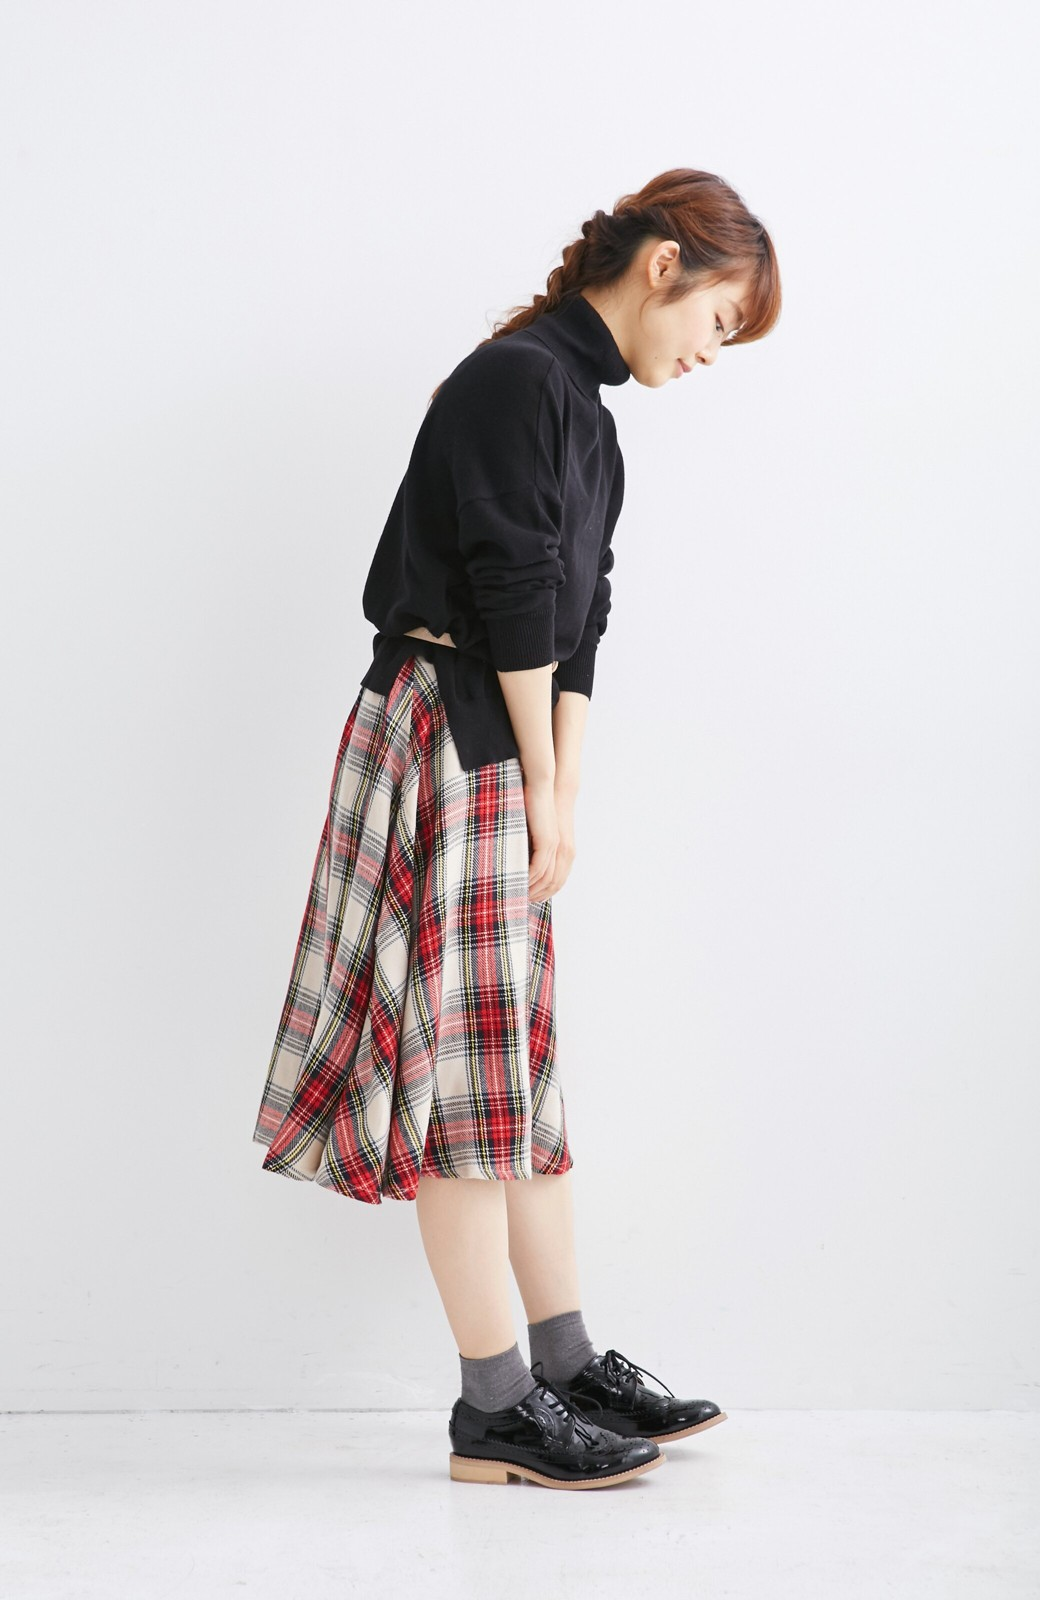 haco! haco.FACTORY スクールチェックフレアースカート <レッド系その他>の商品写真4